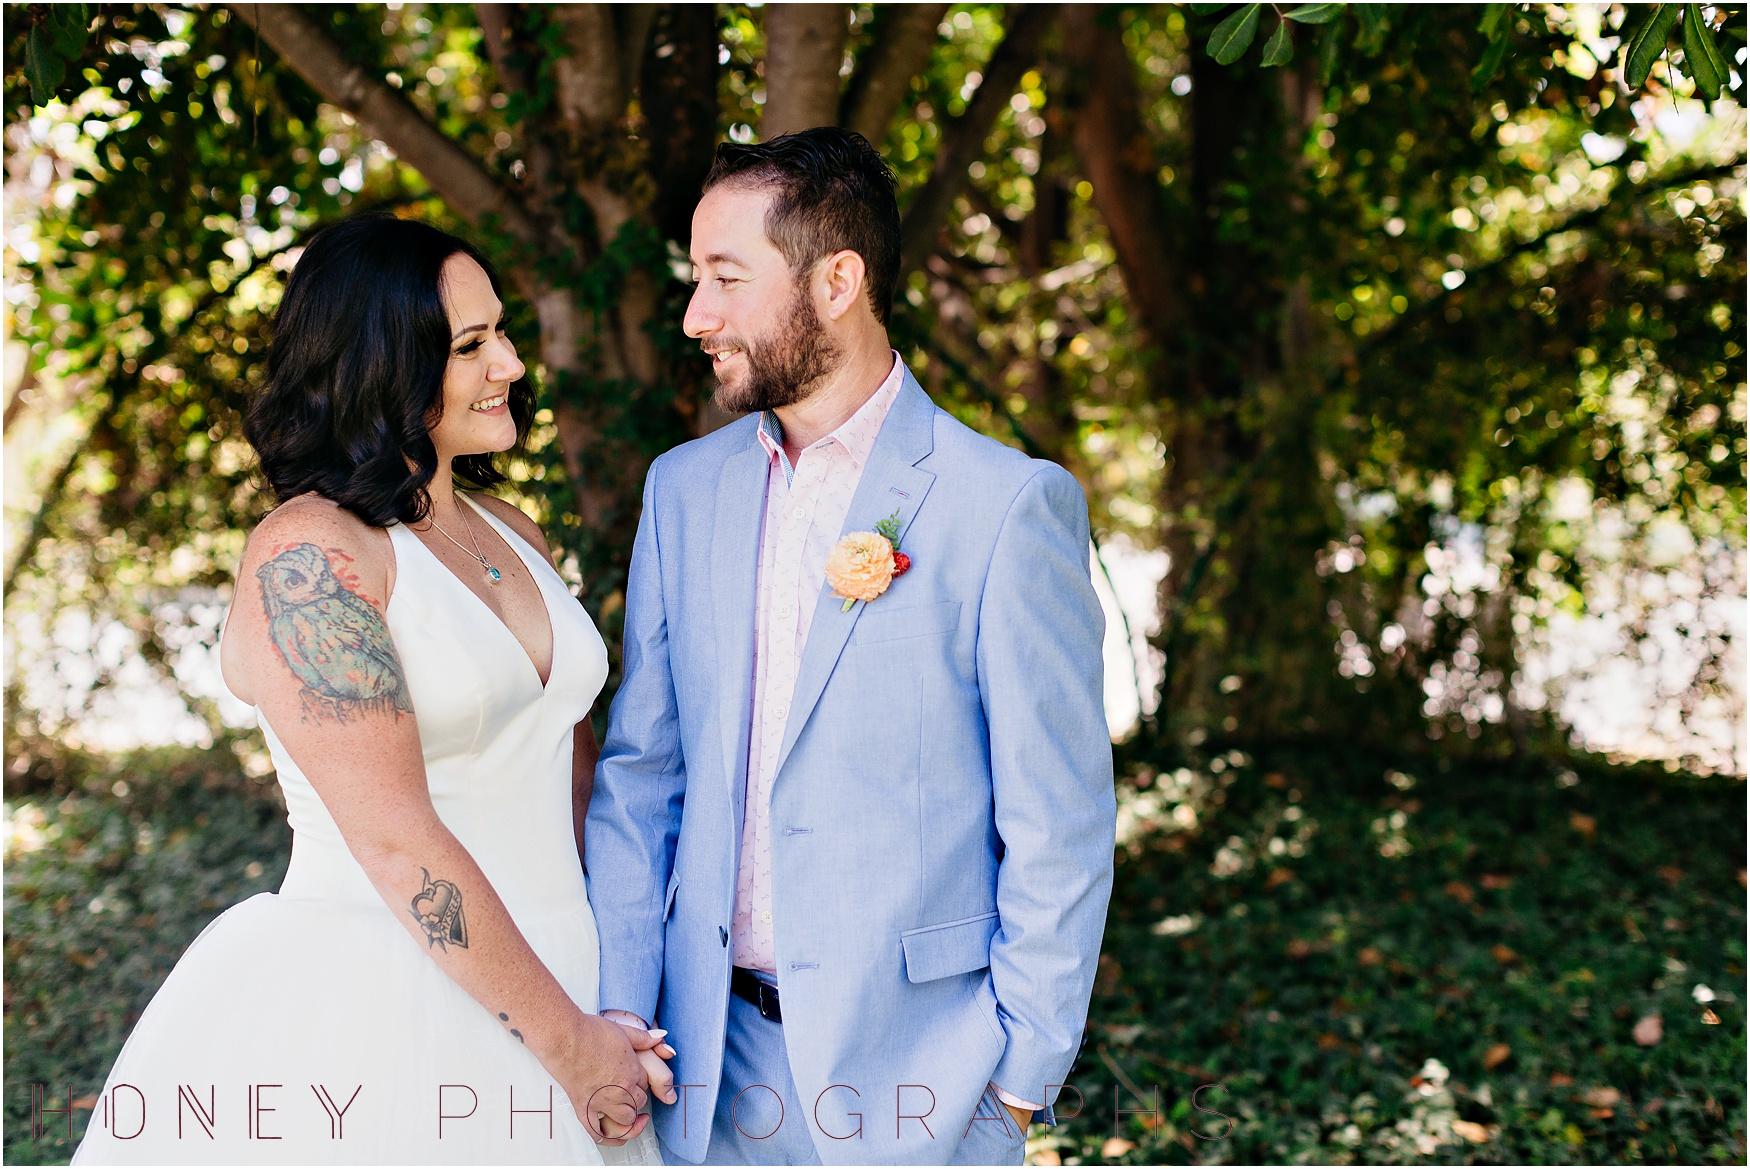 colorful_ecclectic_vibrant_vista_rainbow_quirky_wedding027.jpg